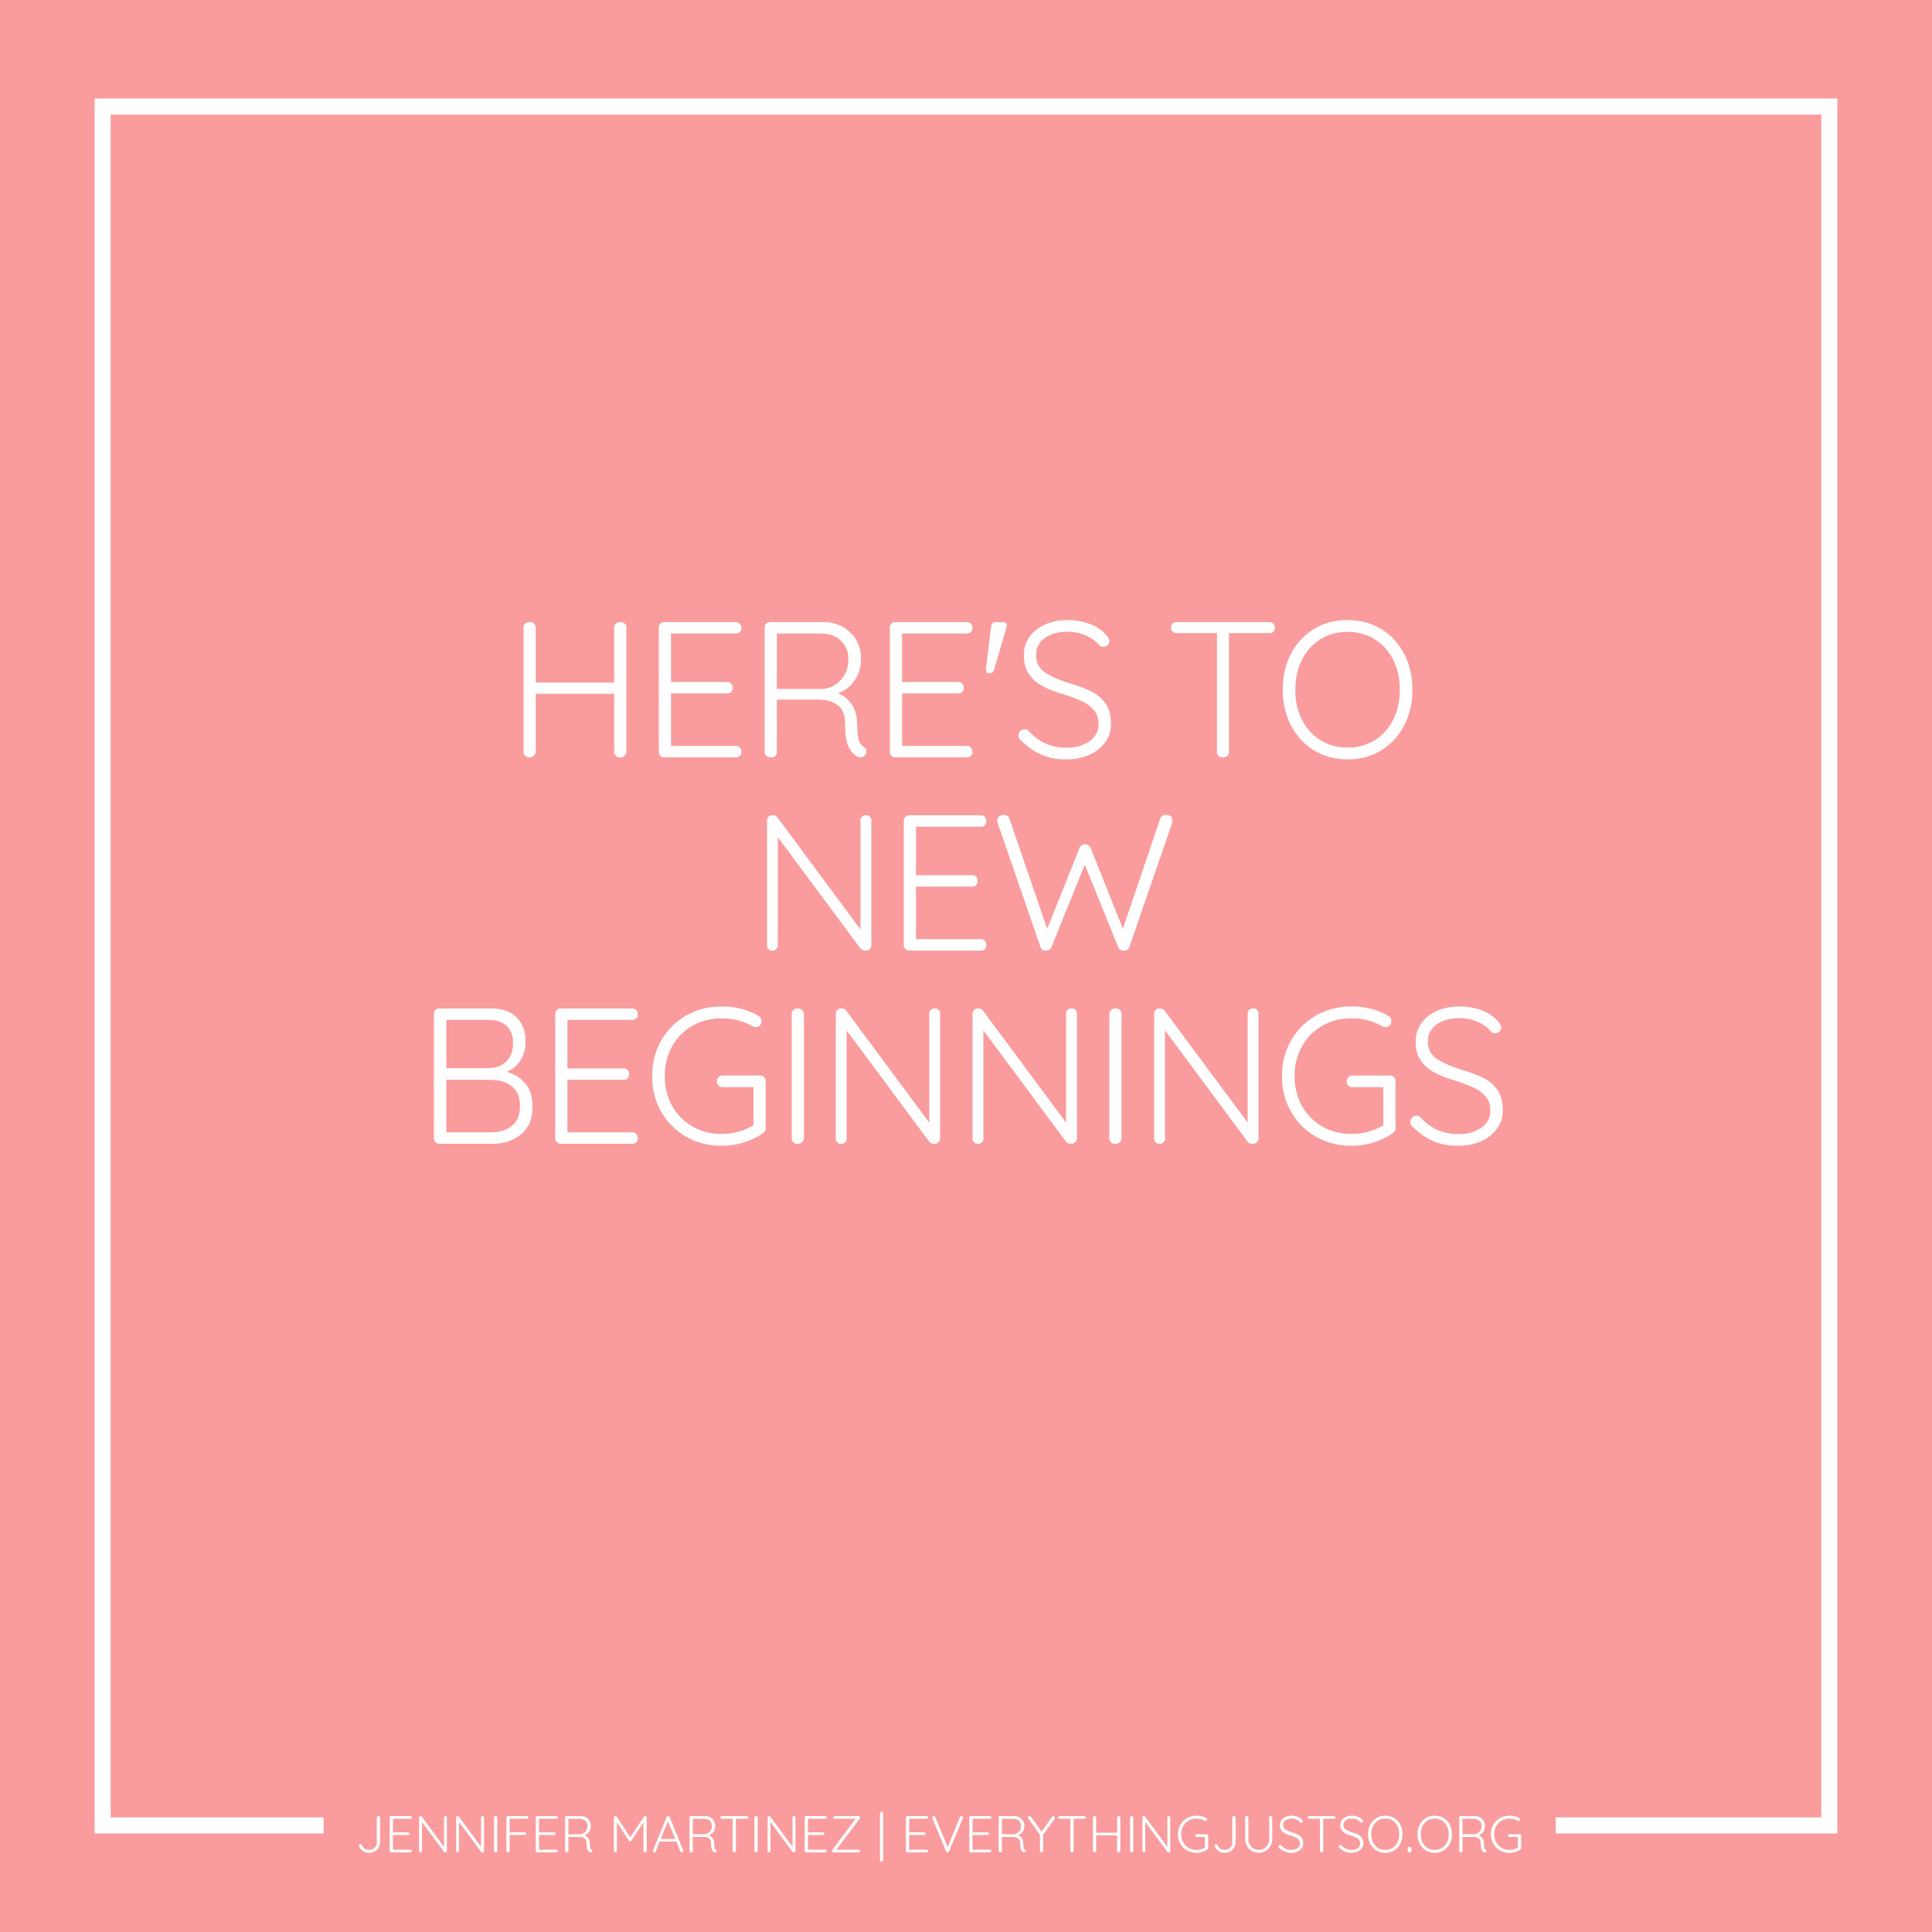 Here's to New Beginnings | Jennifer Martinez | everythingjustso.org